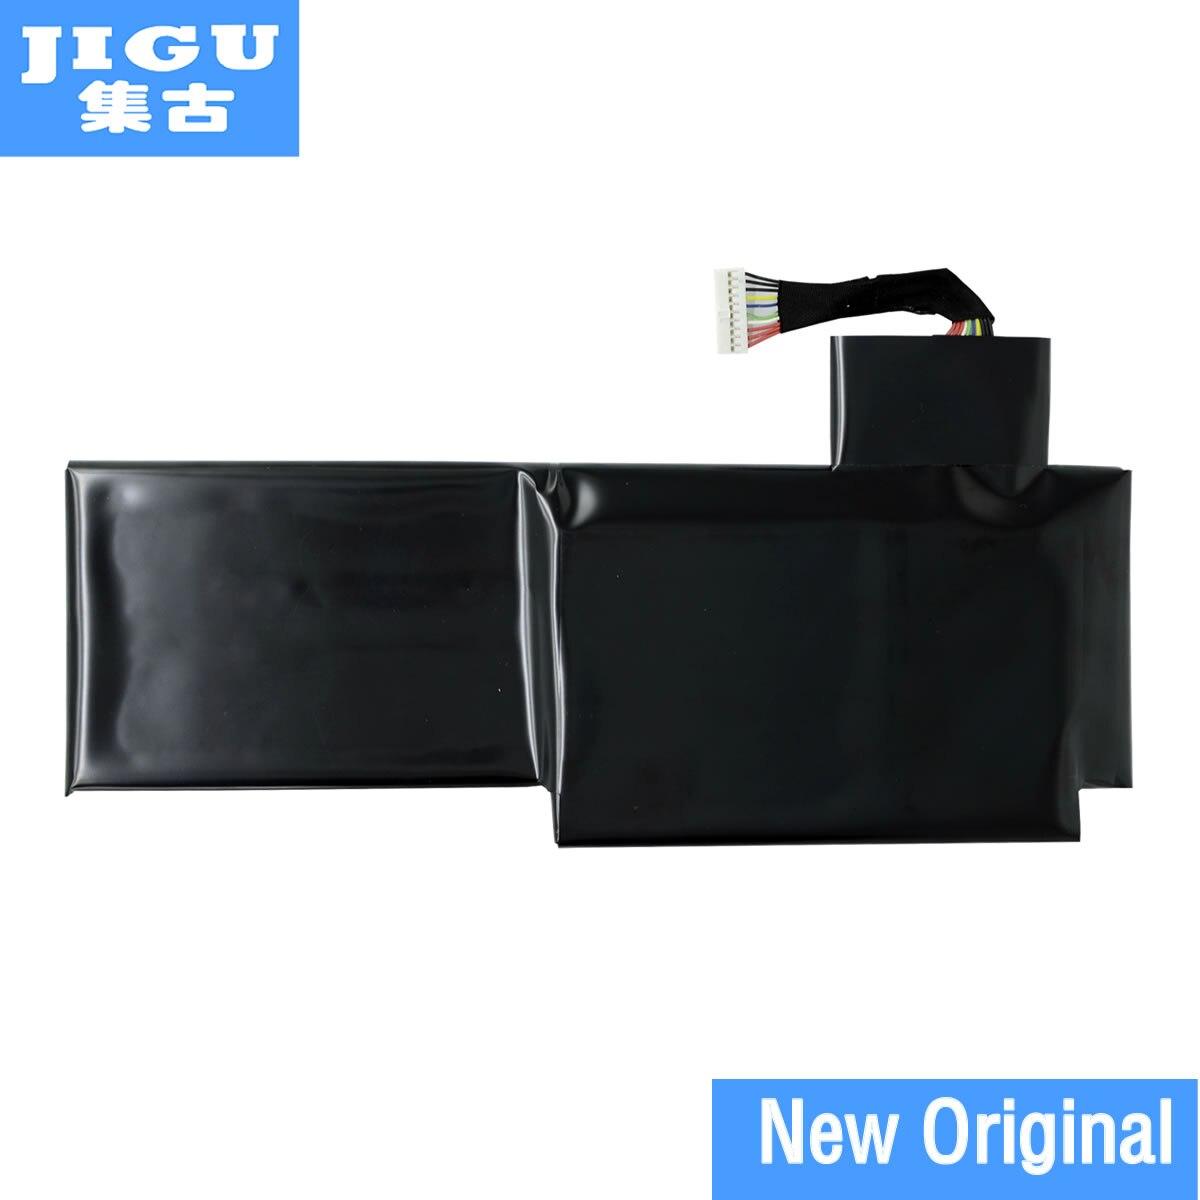 все цены на JIGU BTY-L76 MS-1771 Original laptop Battery For MSI GS70 2PC 2PE 2QC 2QD 2QE FOR MEDION X7613 MD98802 FOR HAIER 7G-700 онлайн